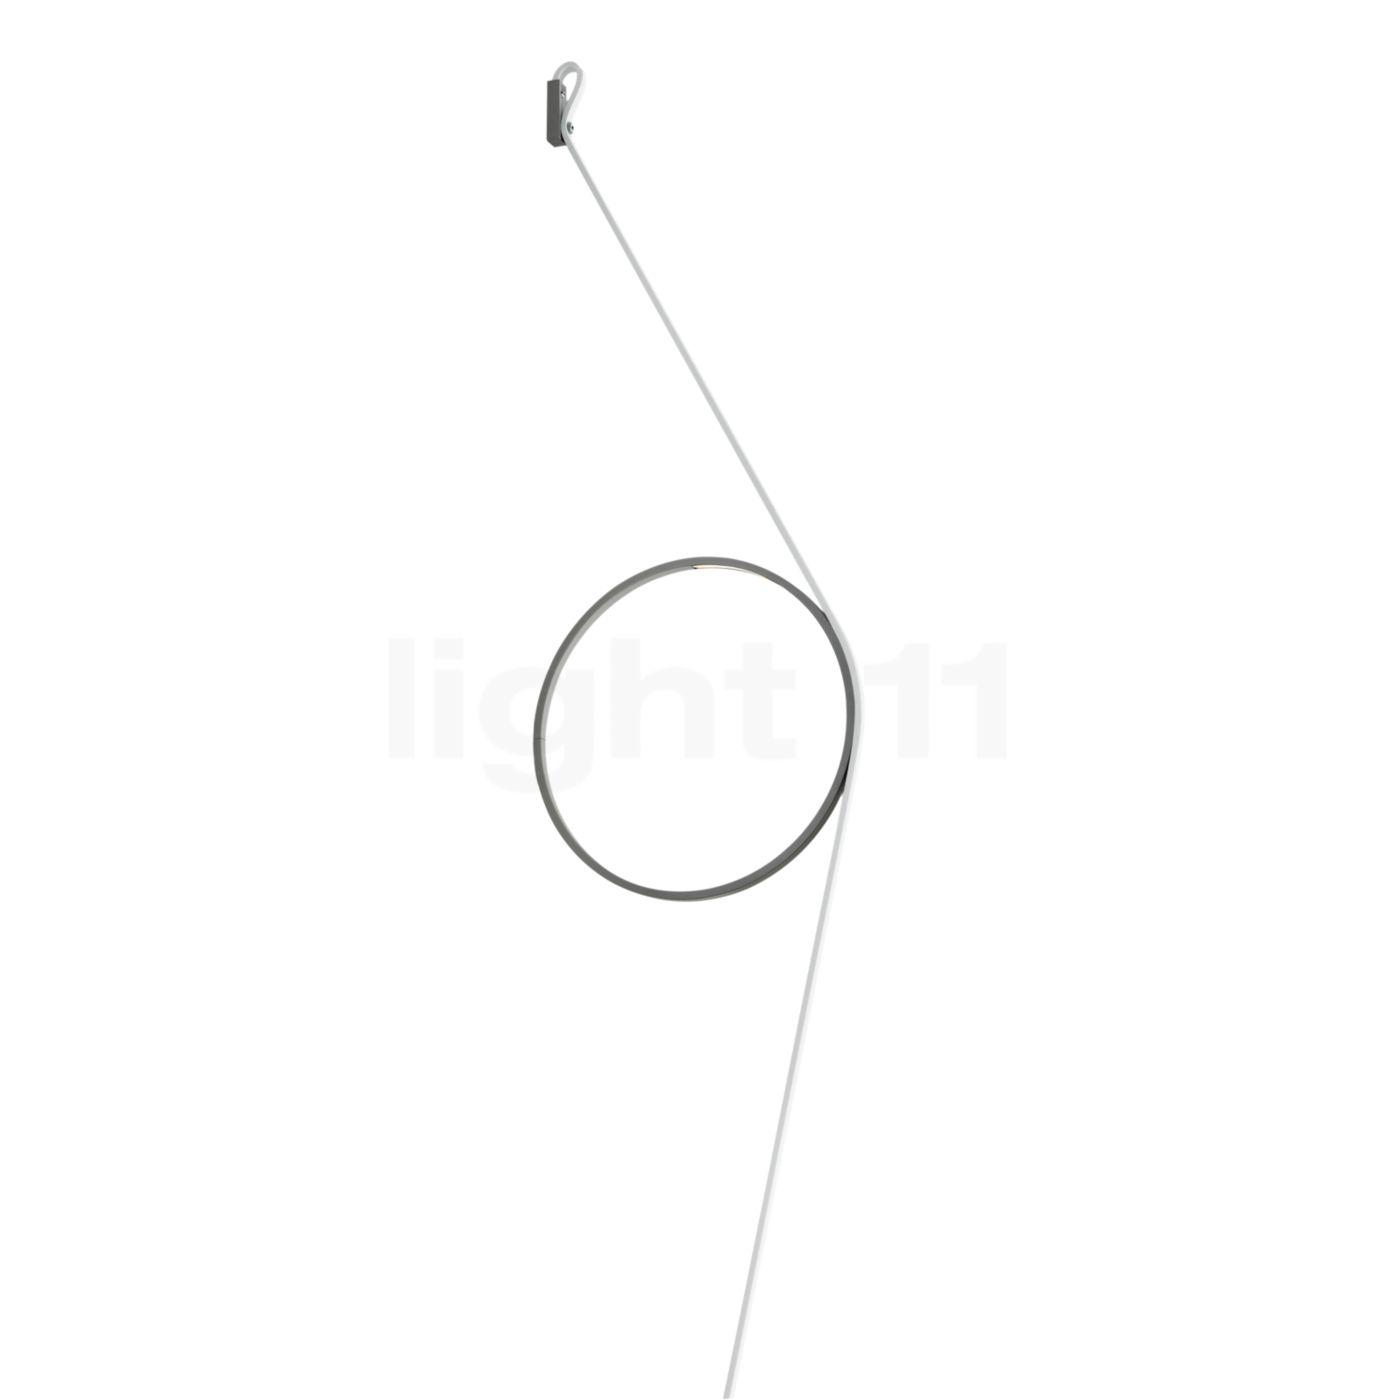 Flos Wirering LED, Kabel weiß/Ring grau F9512020